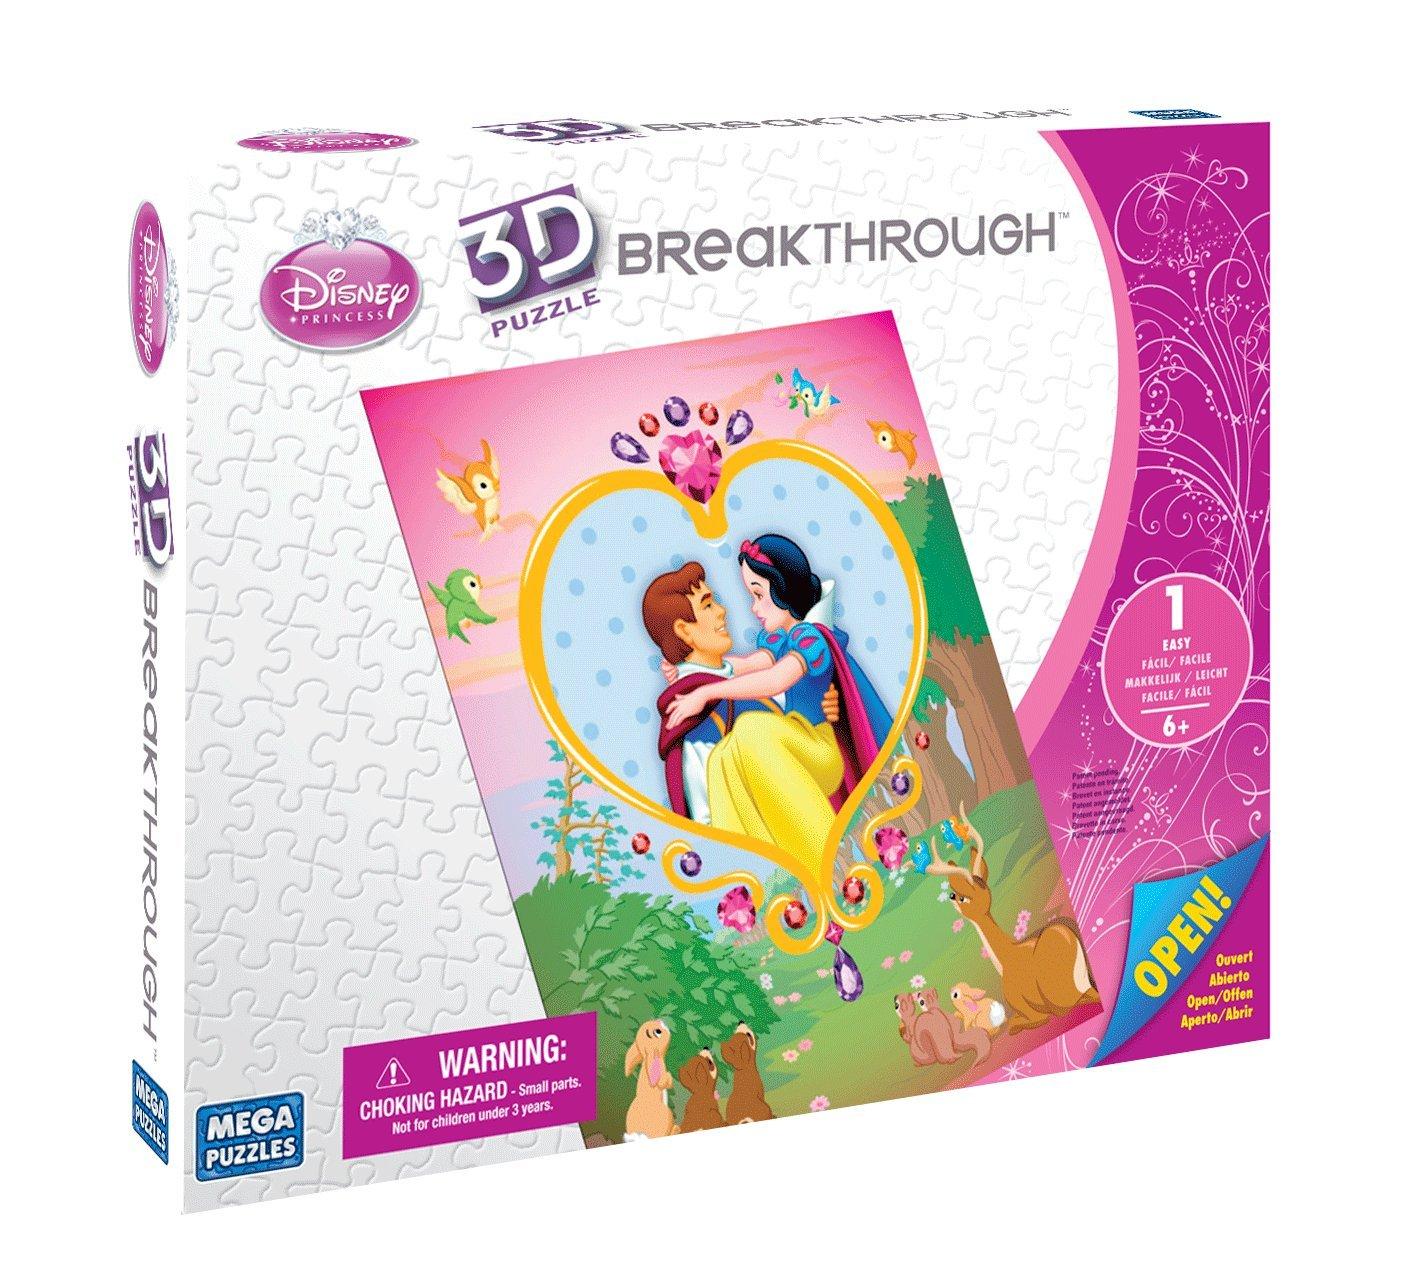 en venta en línea Mega Bloks 50701 50701 50701 - Mega 3D Puzzle Corazón De Princesa 1  a la venta